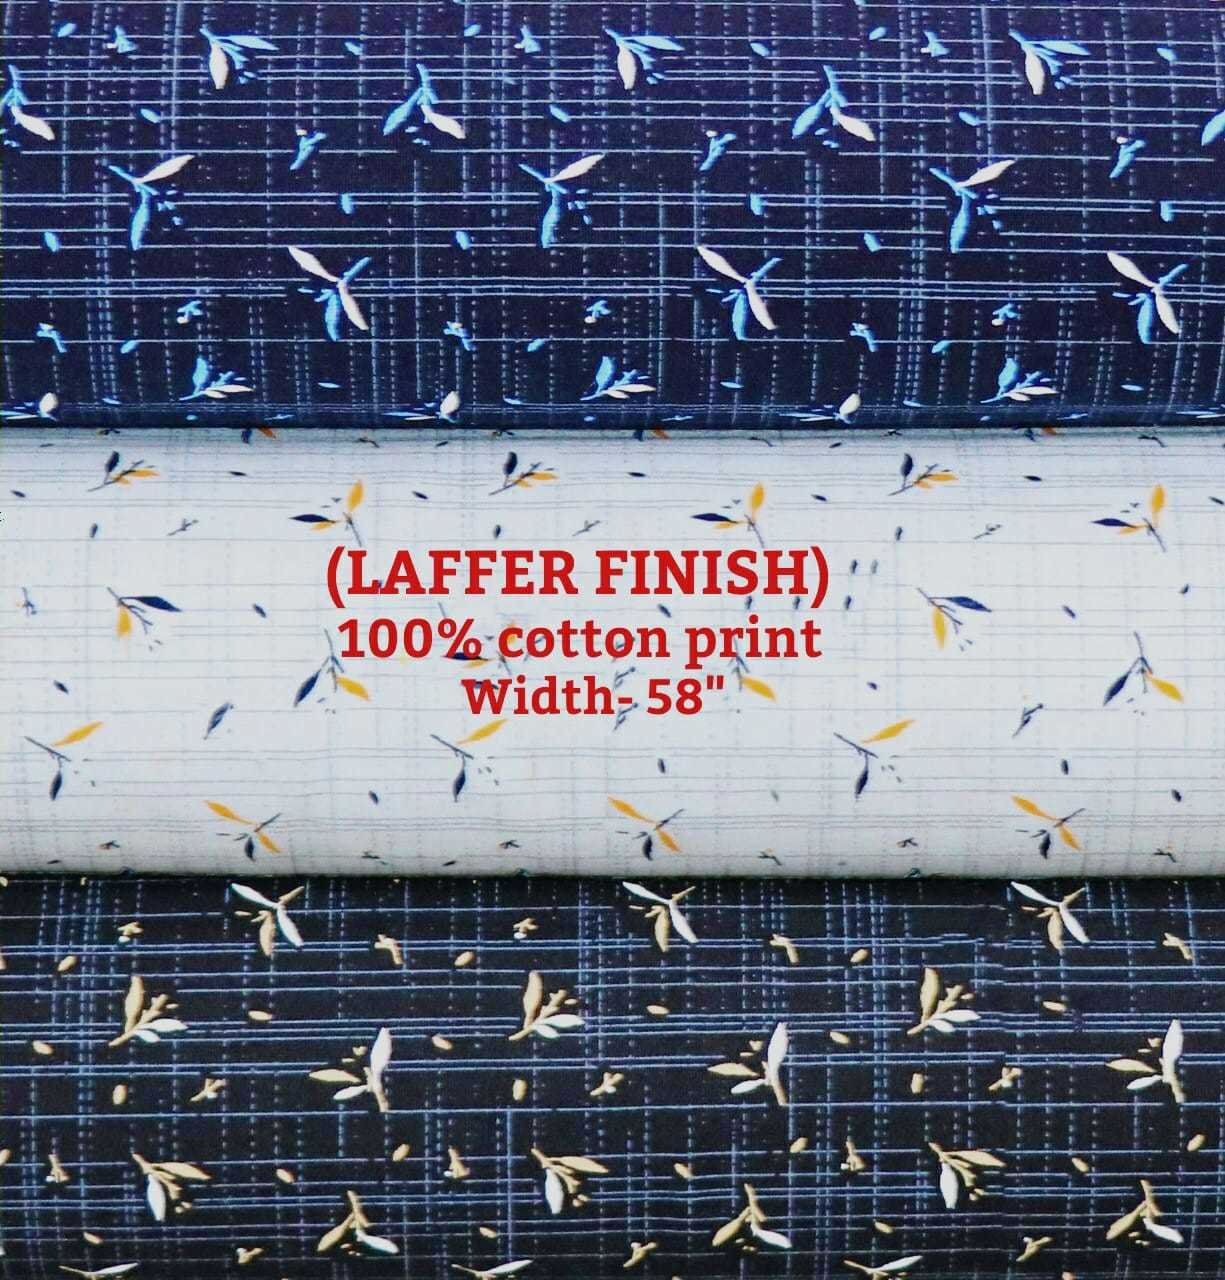 Laffer Finish Textile